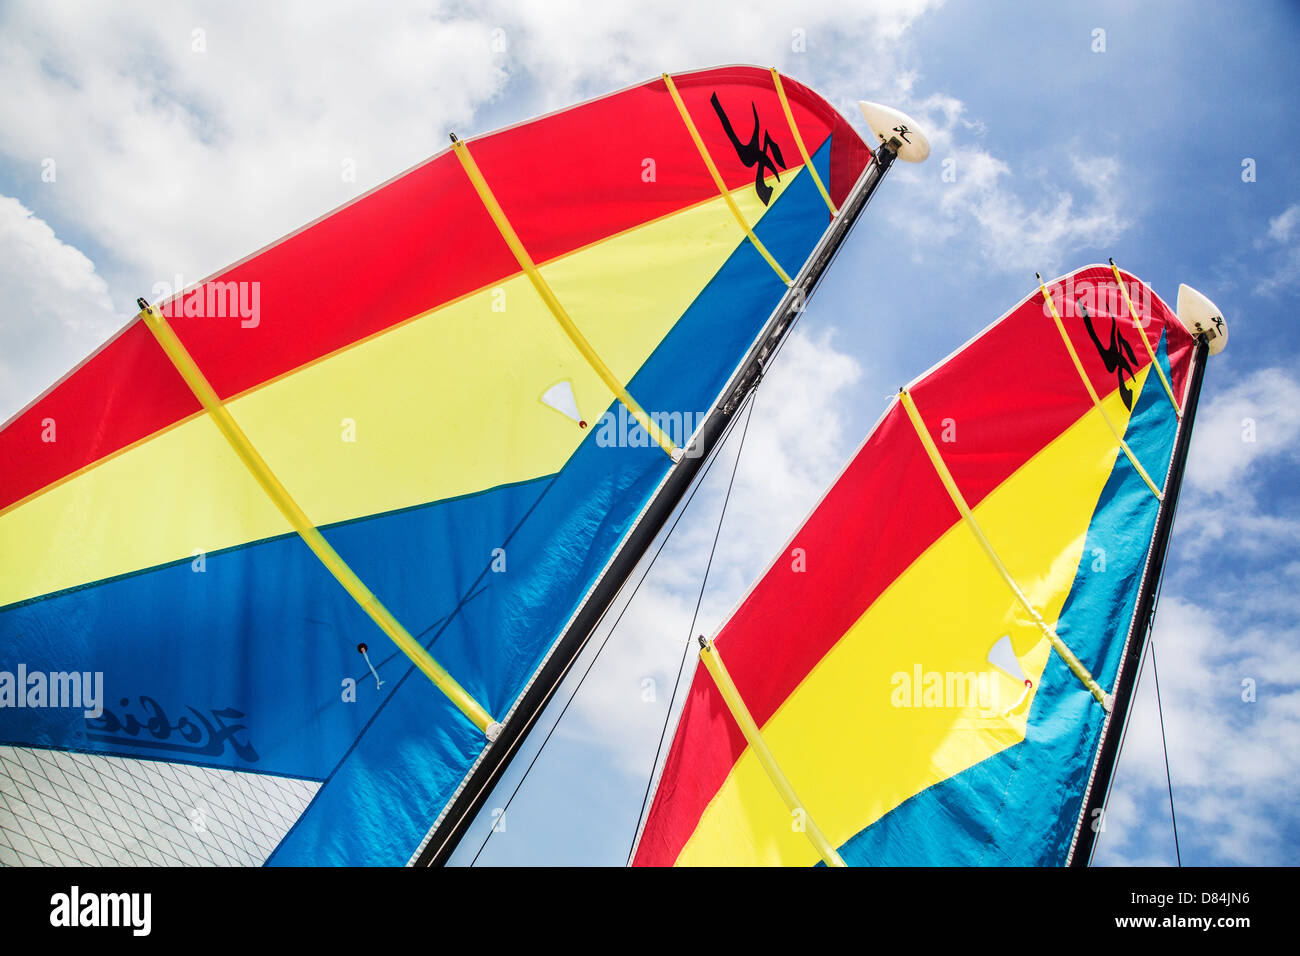 Sails of Hobie sailing dinghies on Rasa Ria beach near Kota Kinabalu in Sabah Borneo - Stock Image